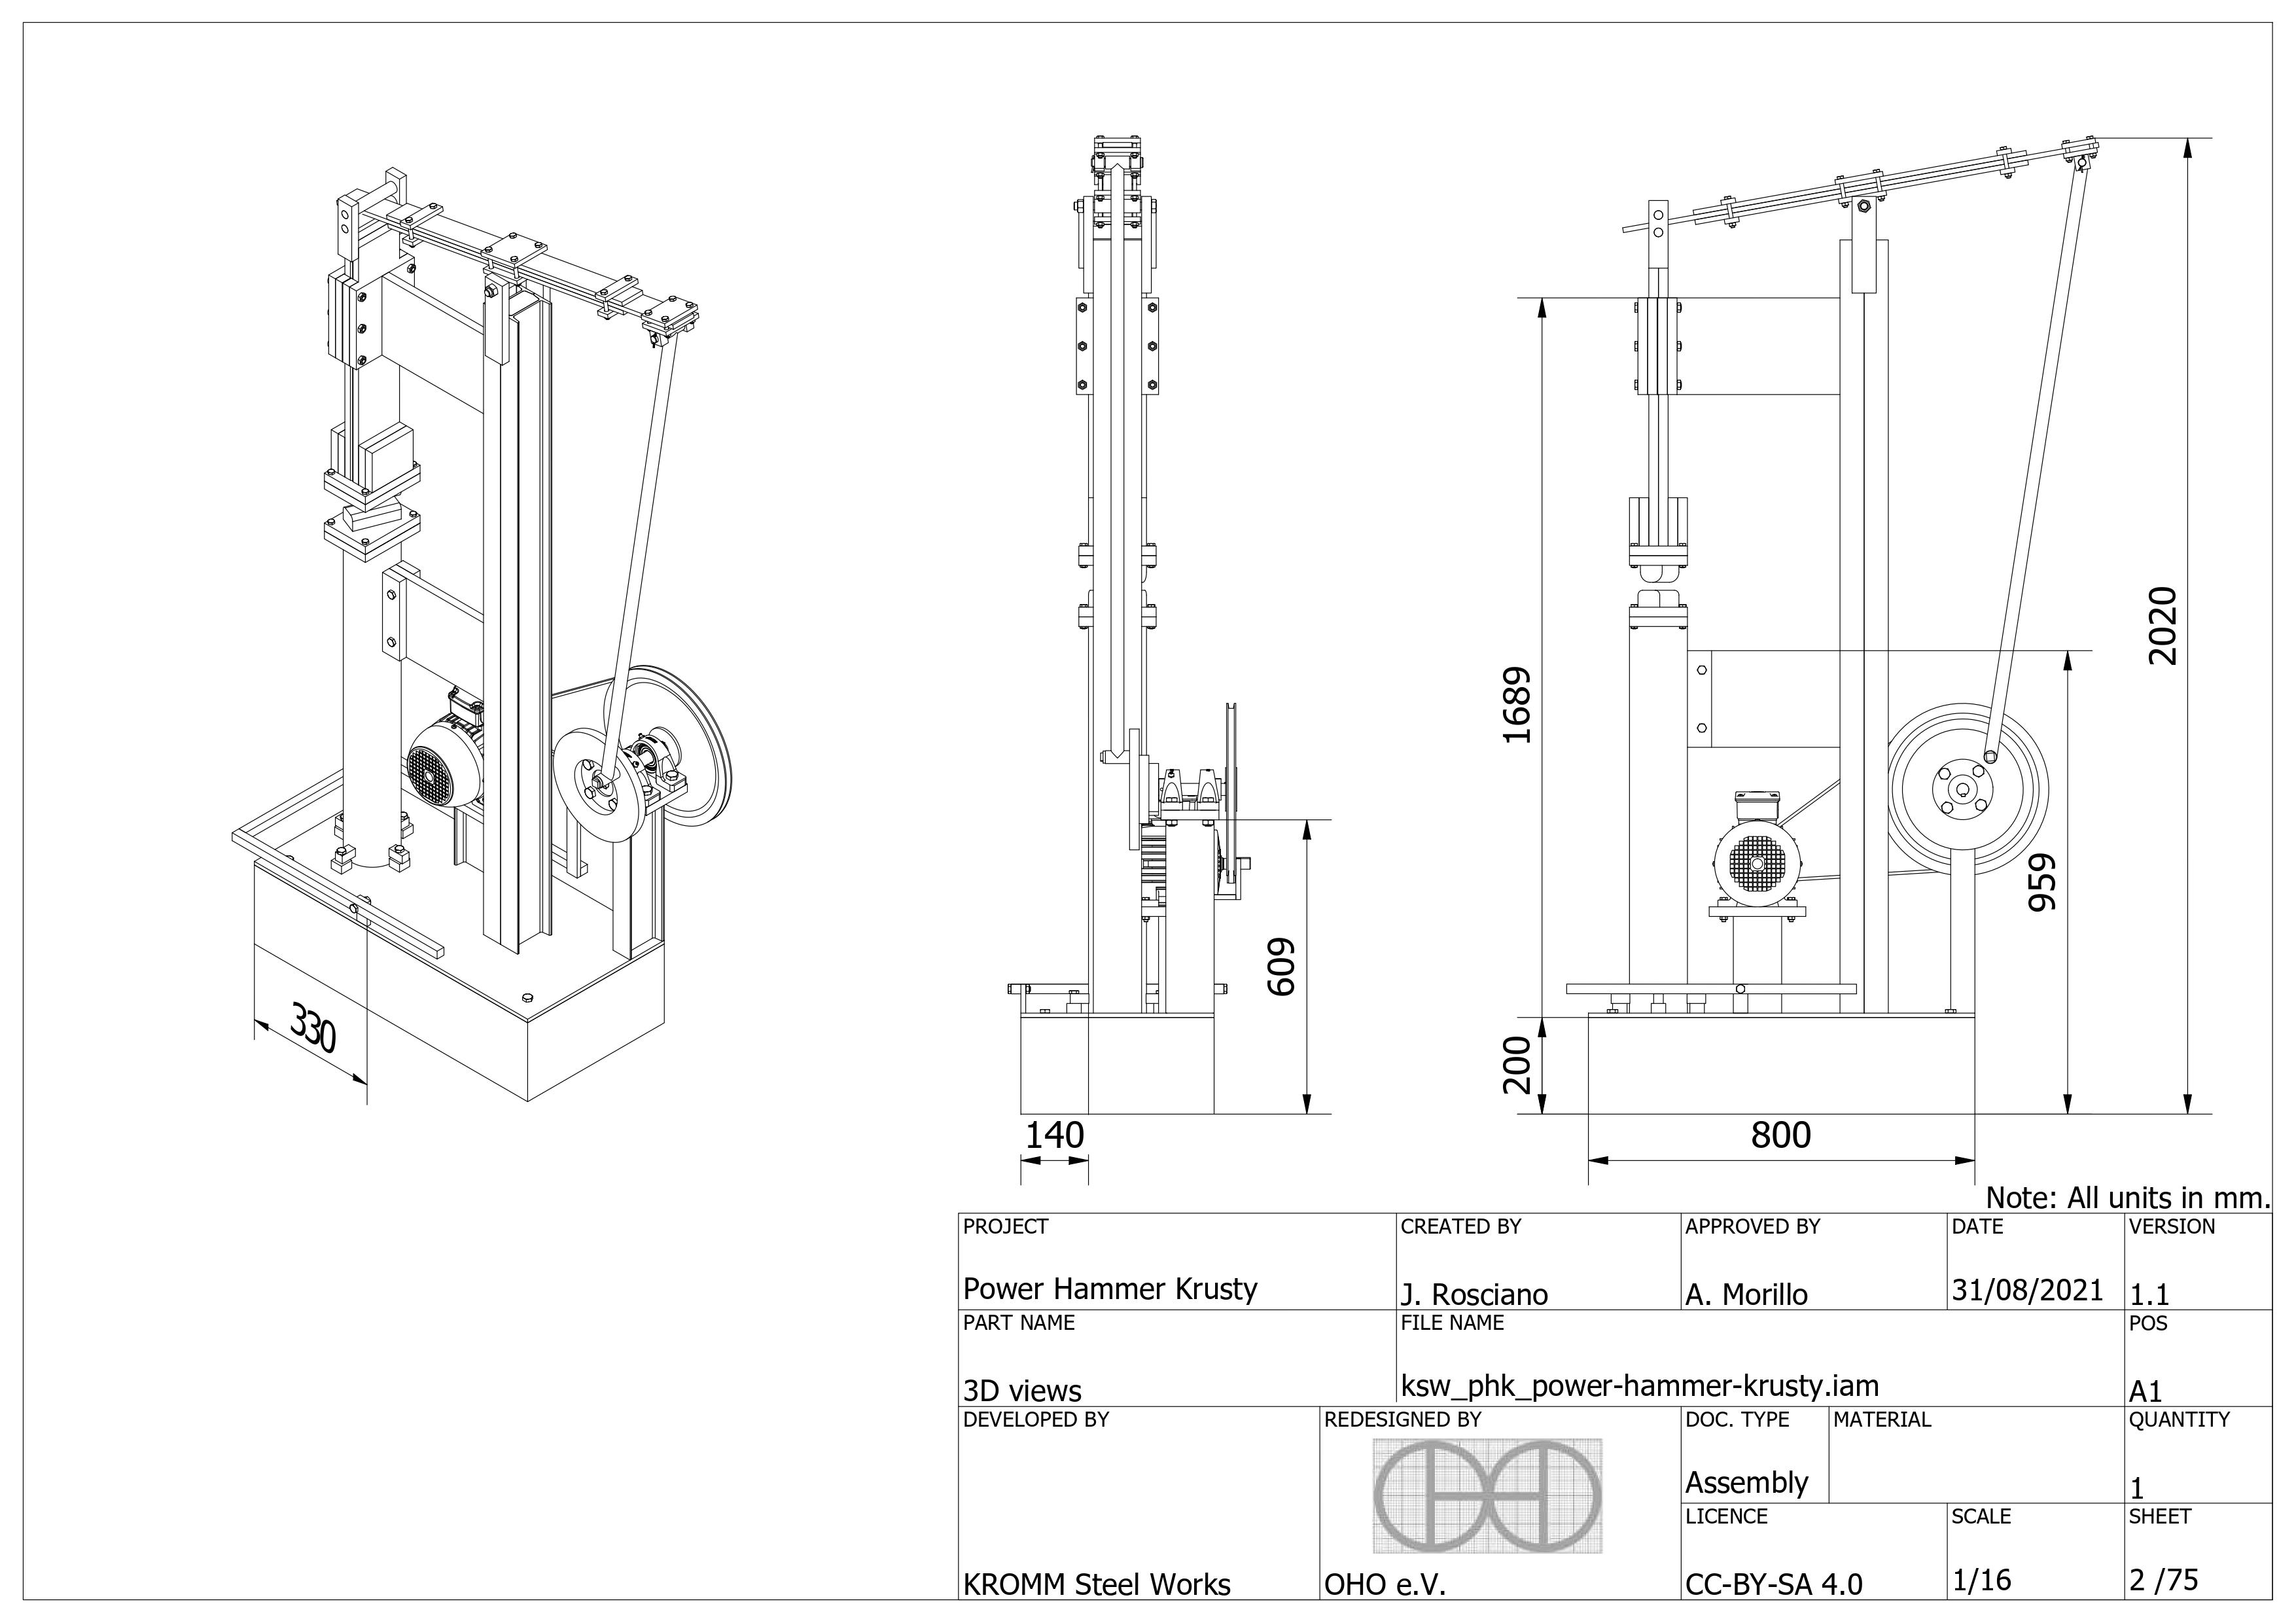 Ksw phk power-hammer-krusty 0002.jpg